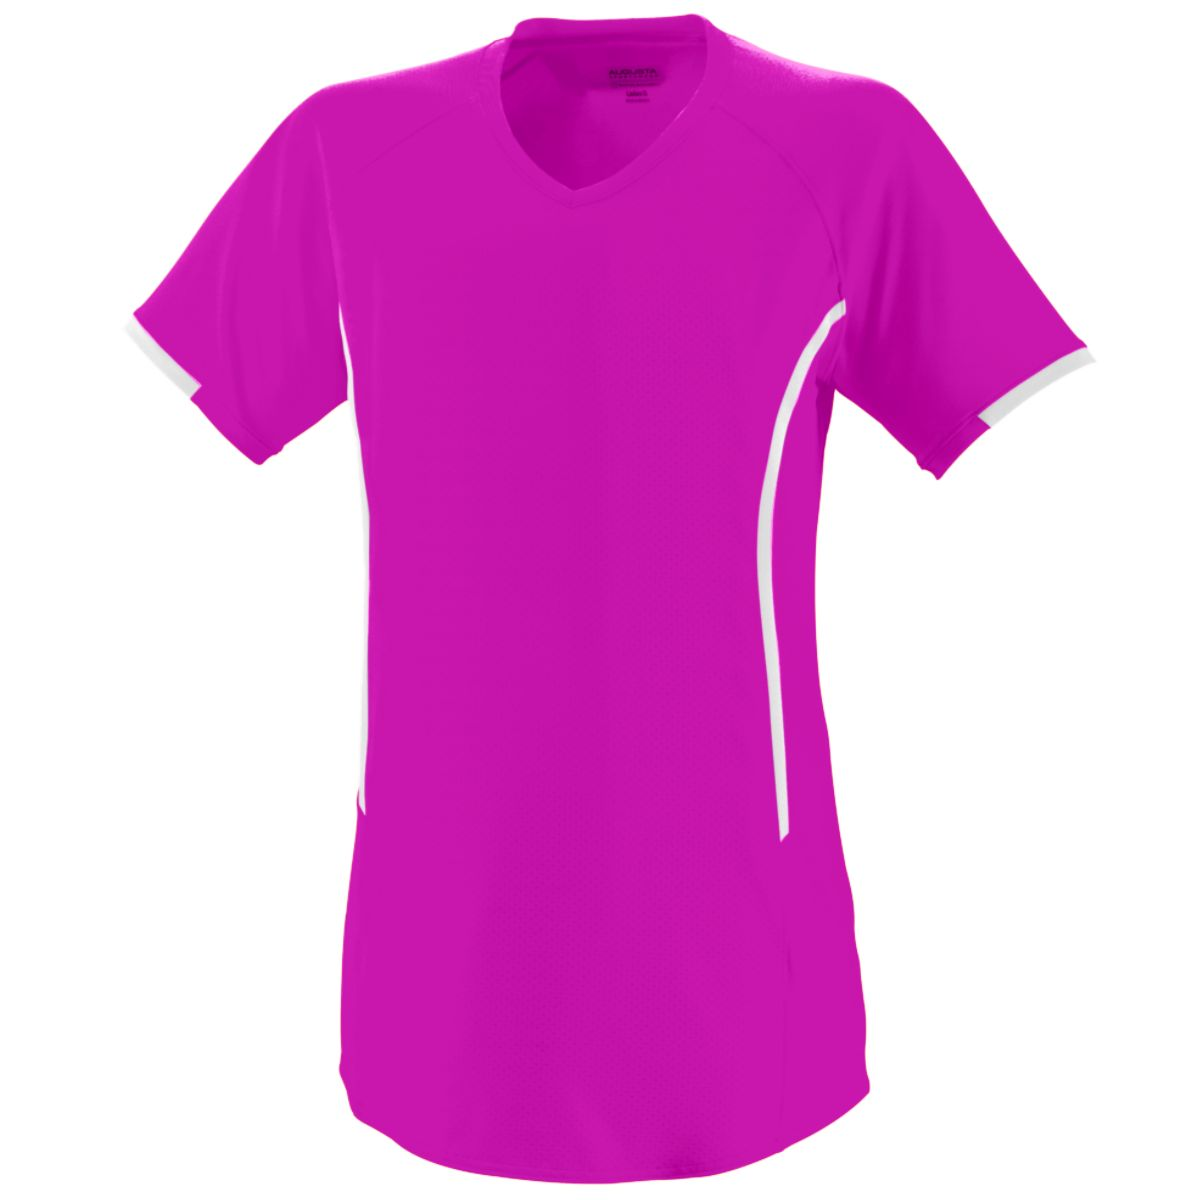 Augusta Ladies Heat Jersey Ppwh 2Xl - image 1 de 1